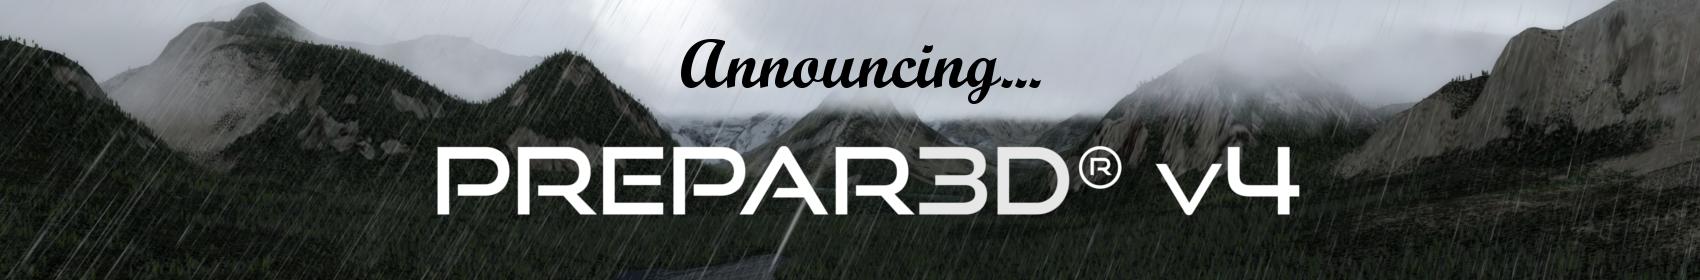 announcement_v4